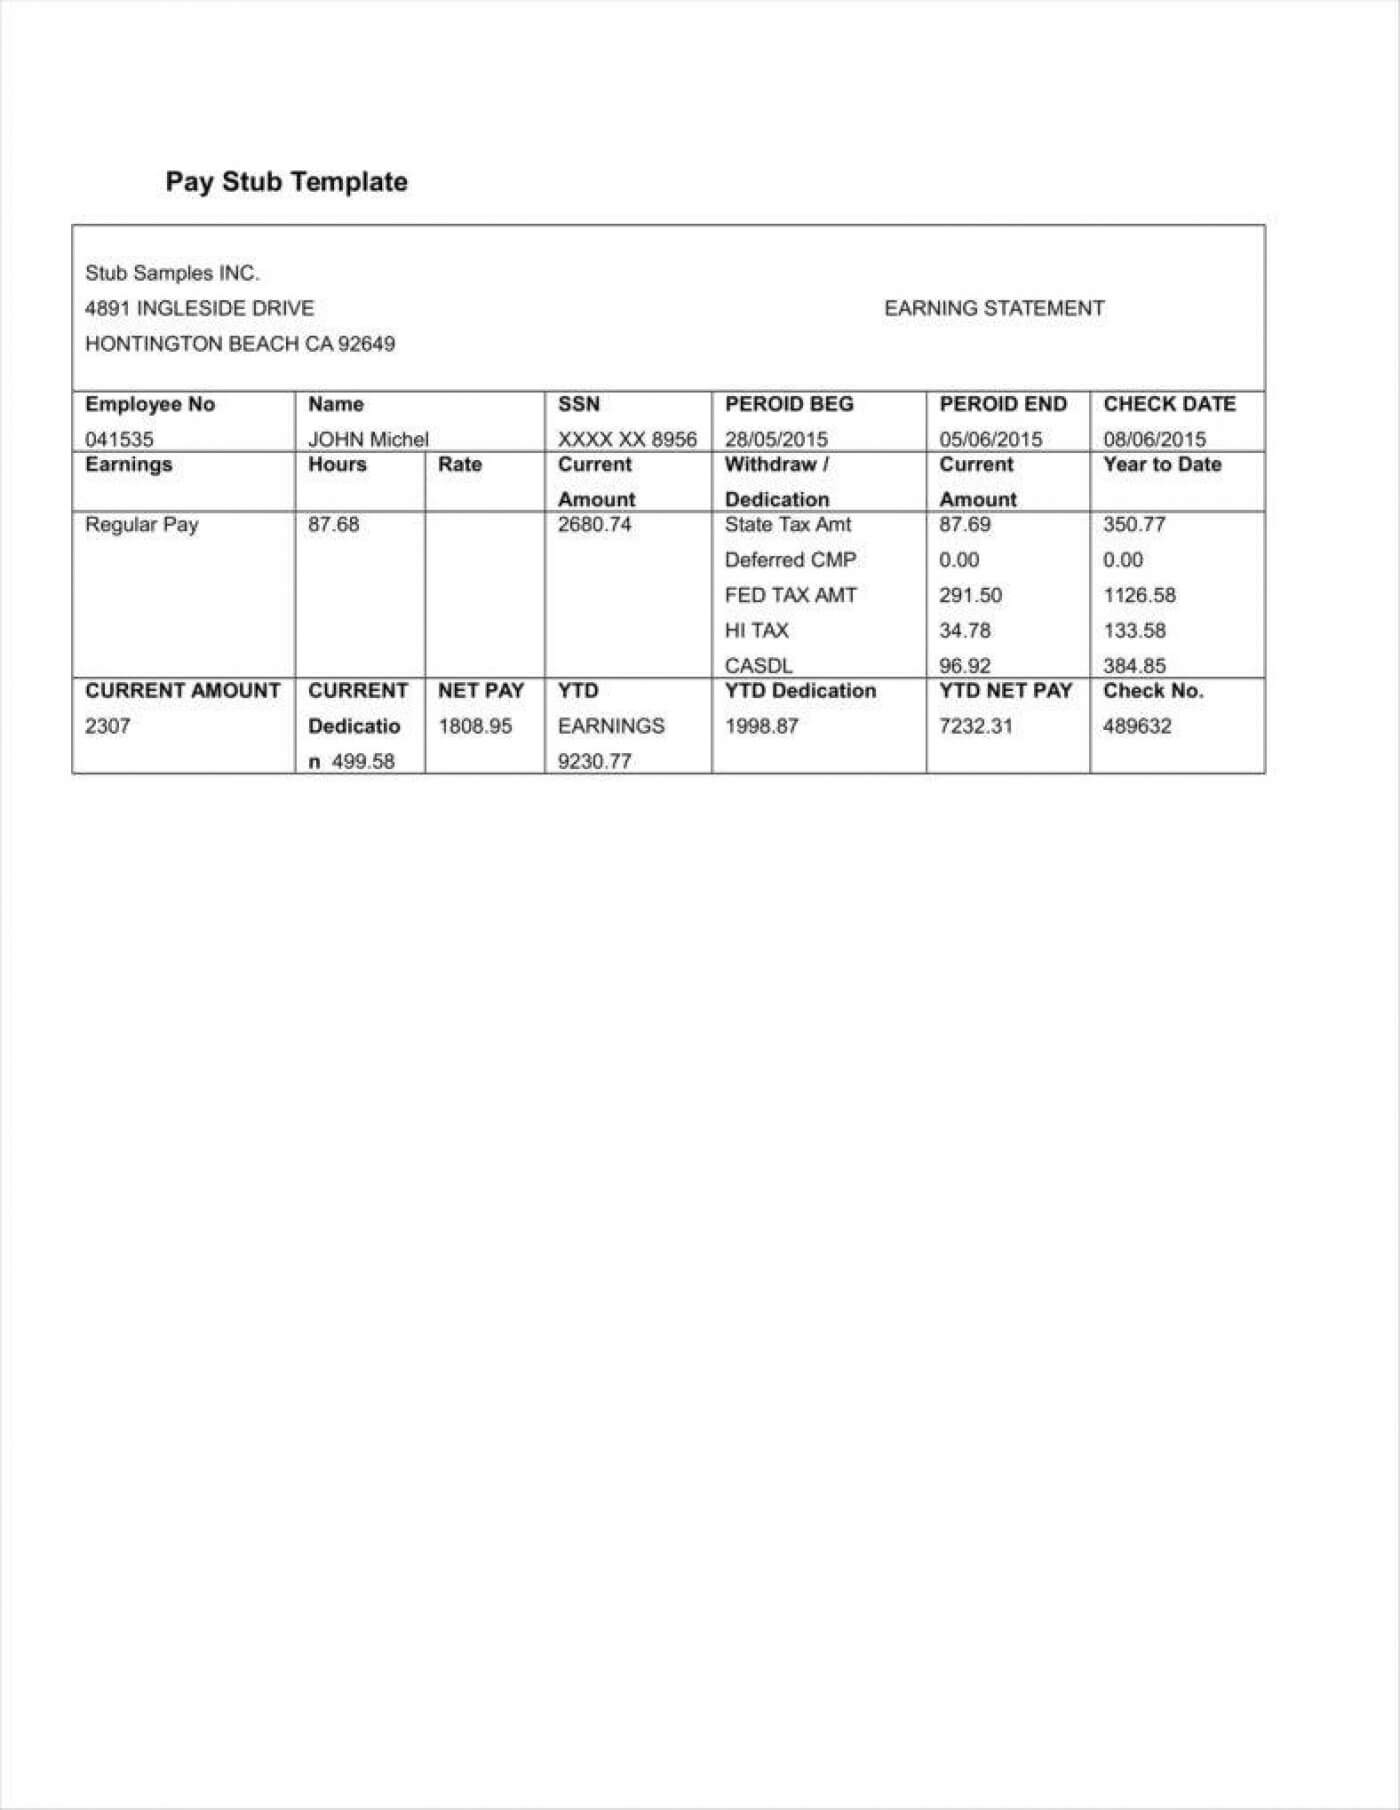 030 Free Printable Paycheck Stub Templates Pay Template Word Intended For Pay Stub Template Word Document